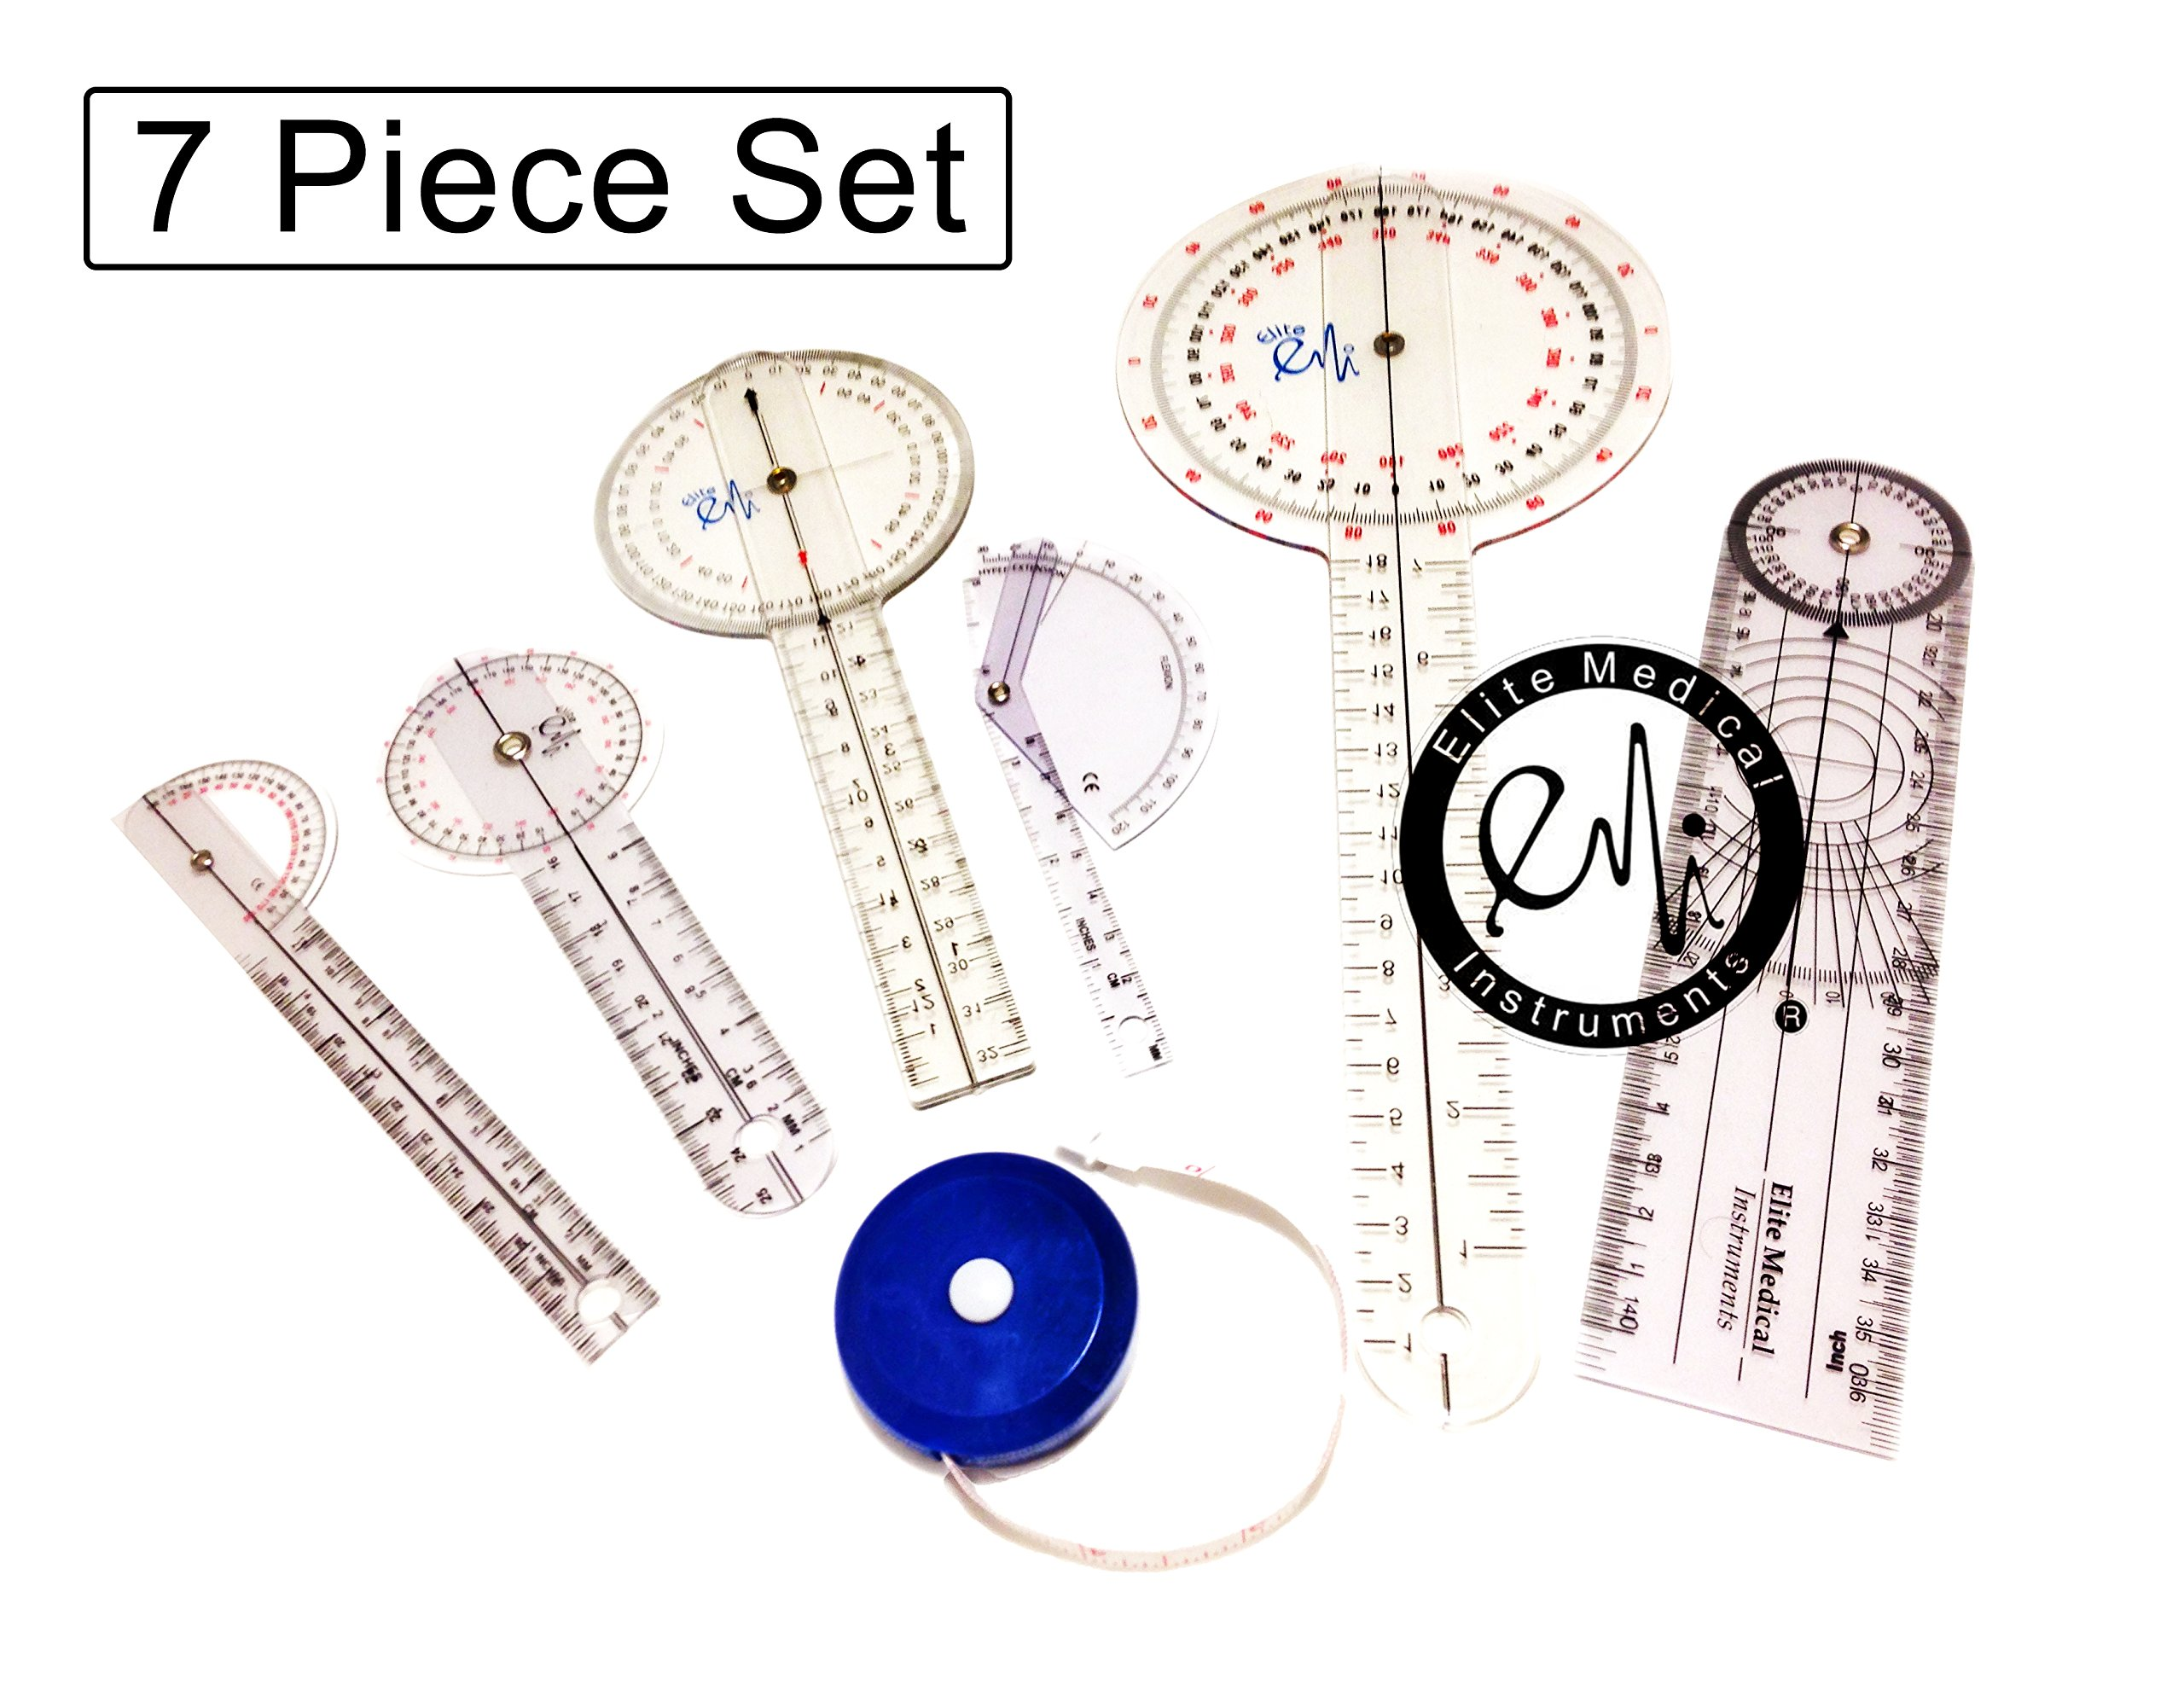 EMI 6 Piece Goniometer Set Plus Measuring Tape - 7 Pieces Total EGM-431